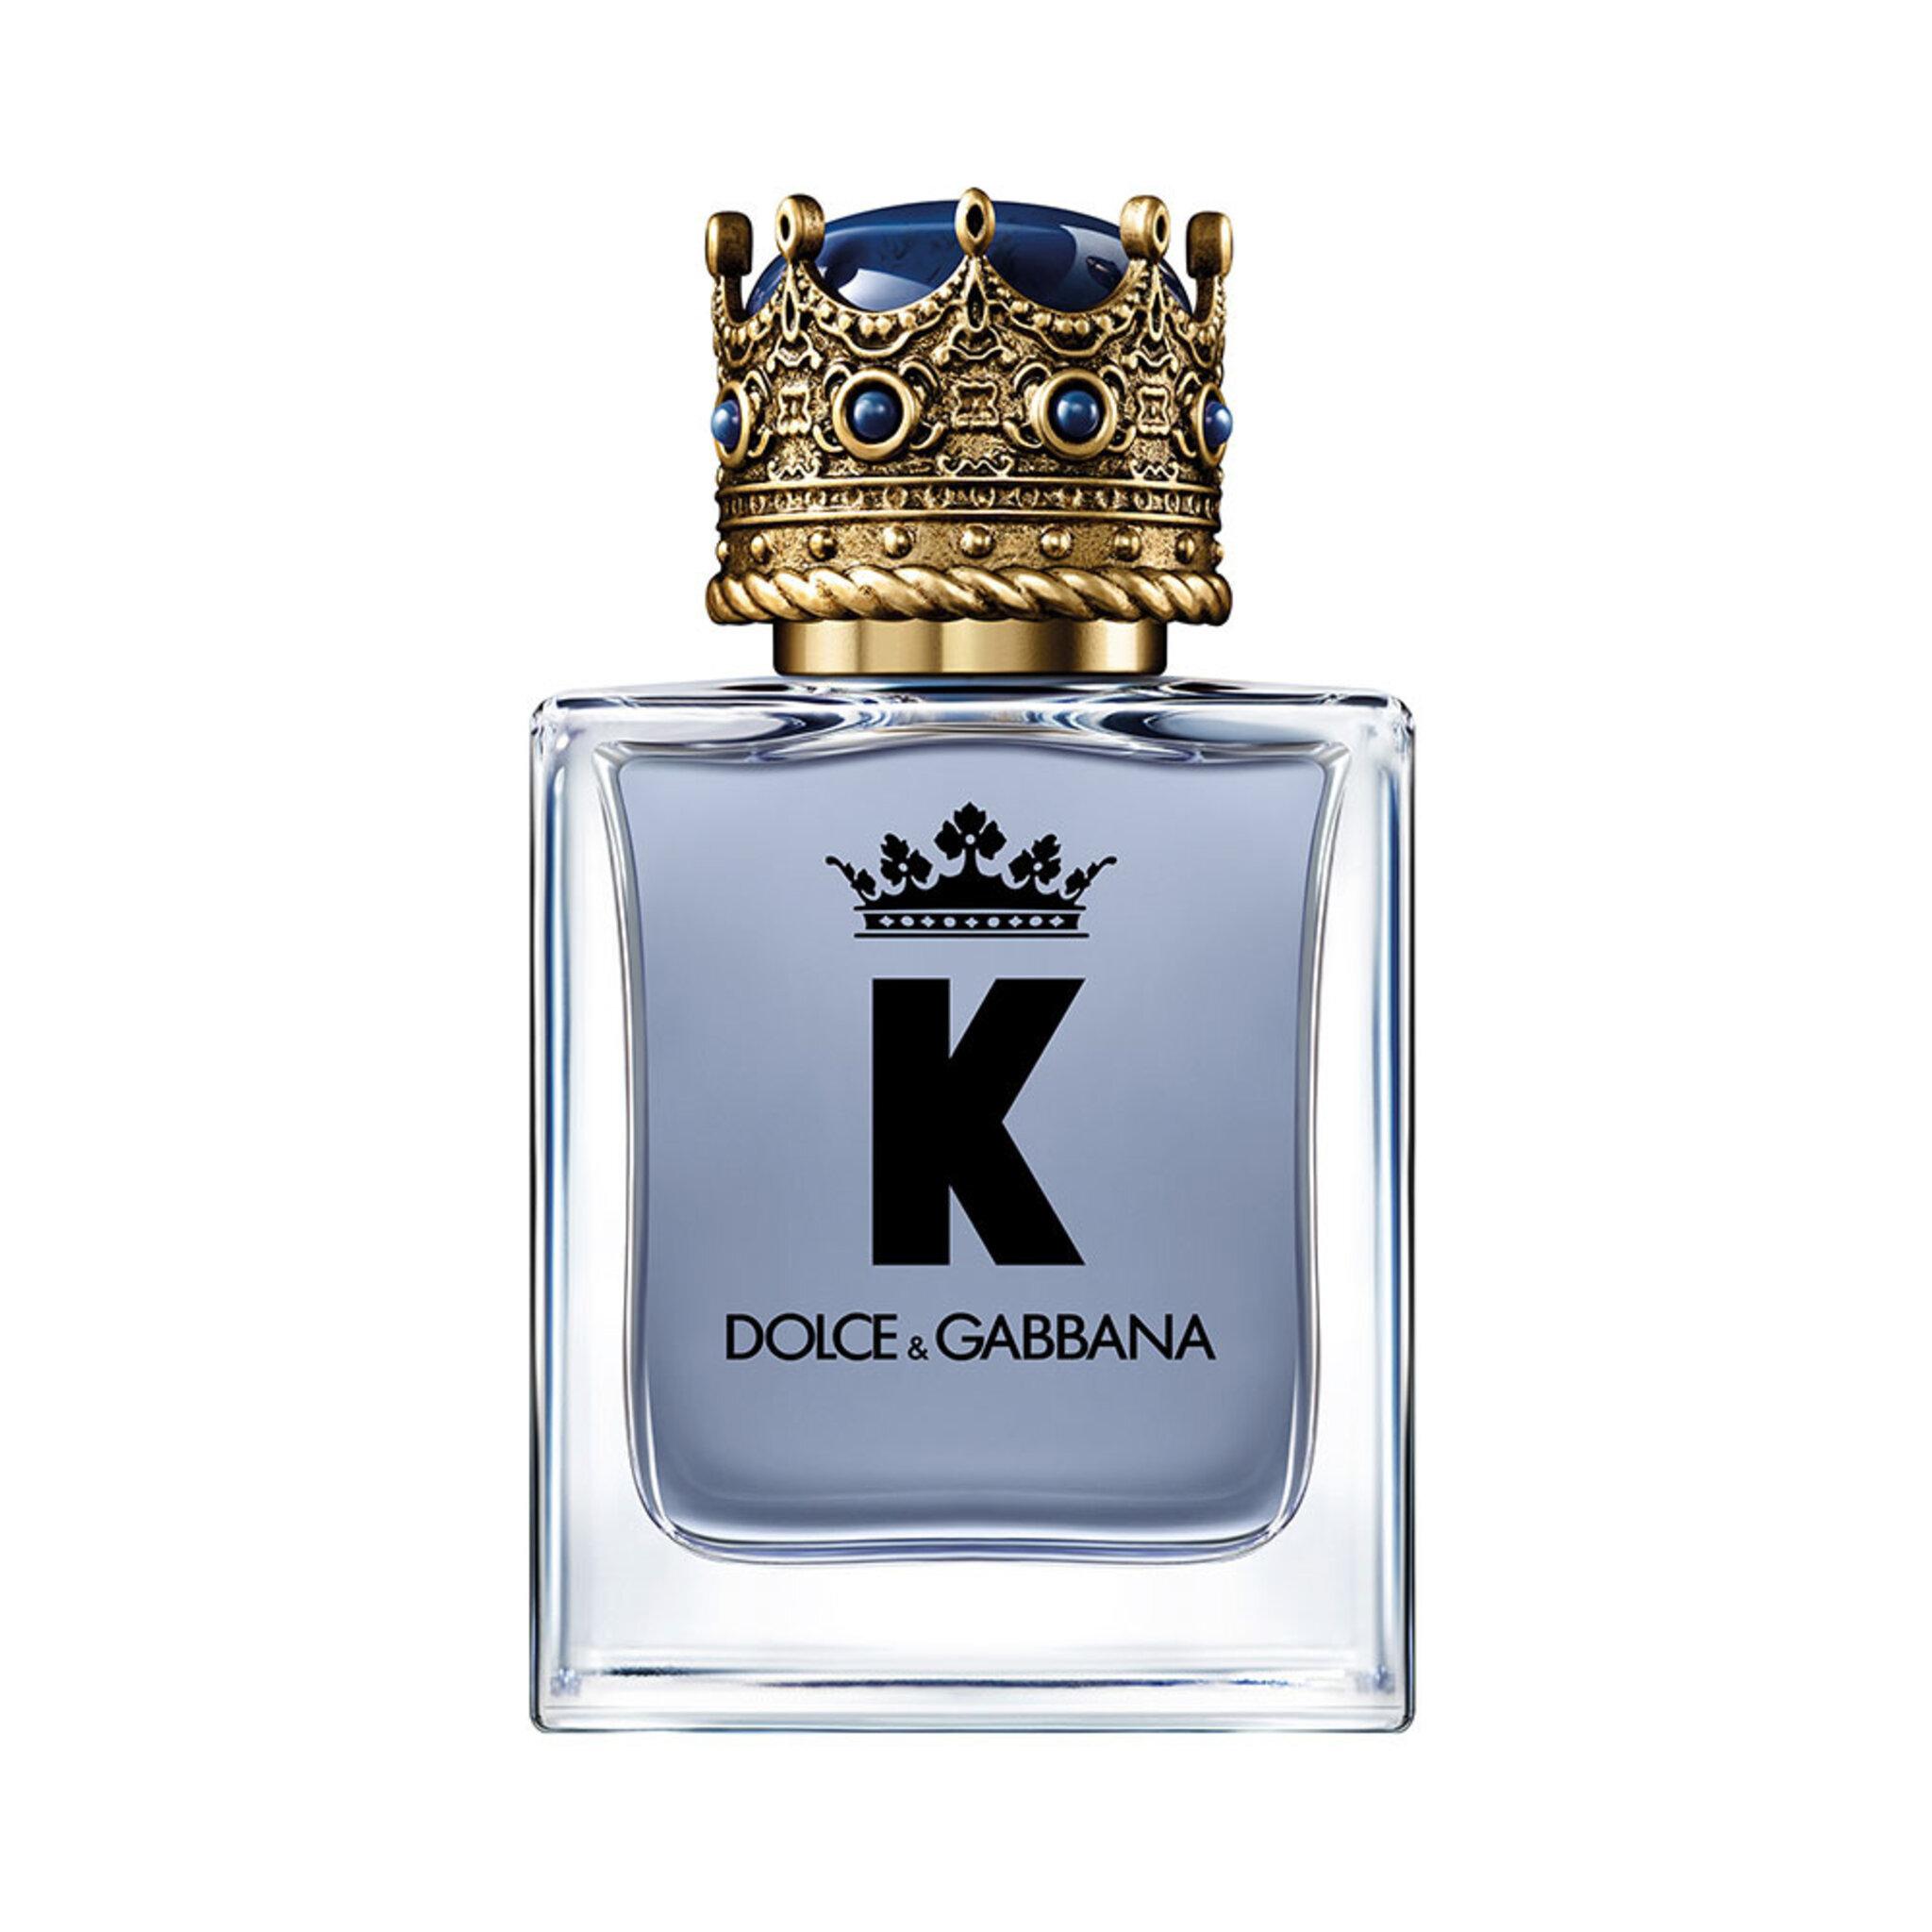 K By Dolce & Gabbana Edt